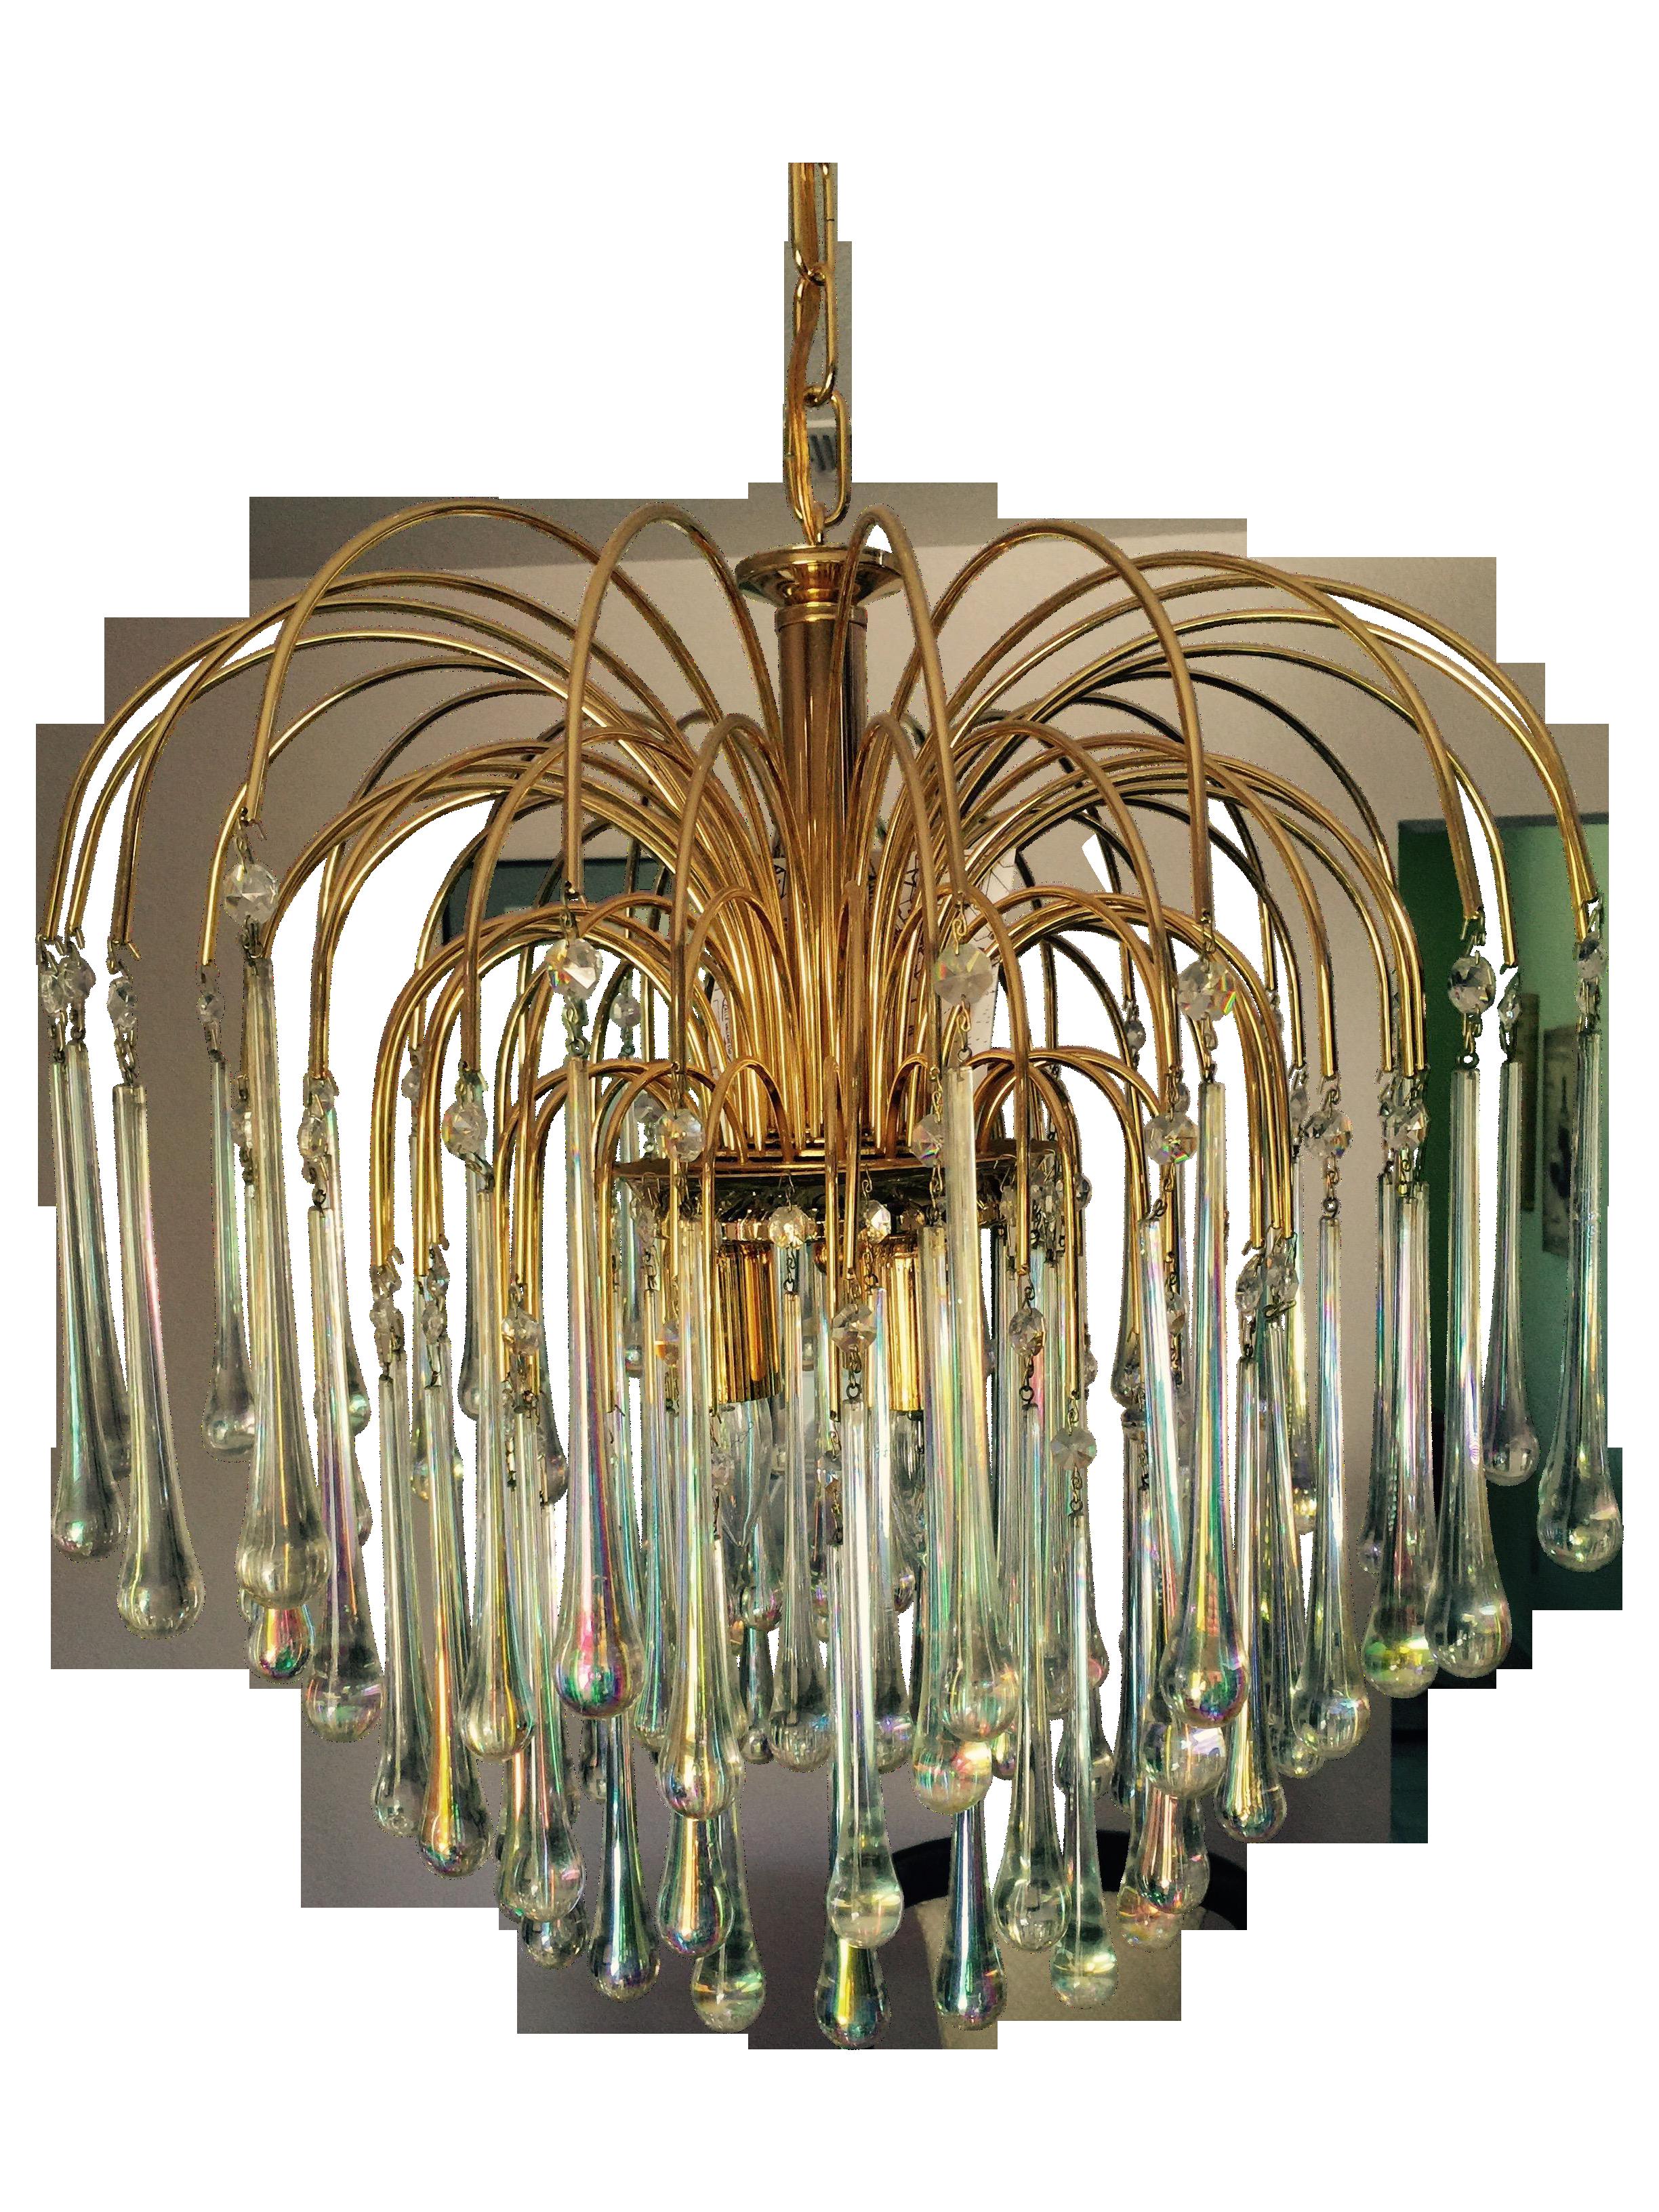 Murano italy vecchio glass chandelier on chairish chandeliers chandeliers arubaitofo Choice Image